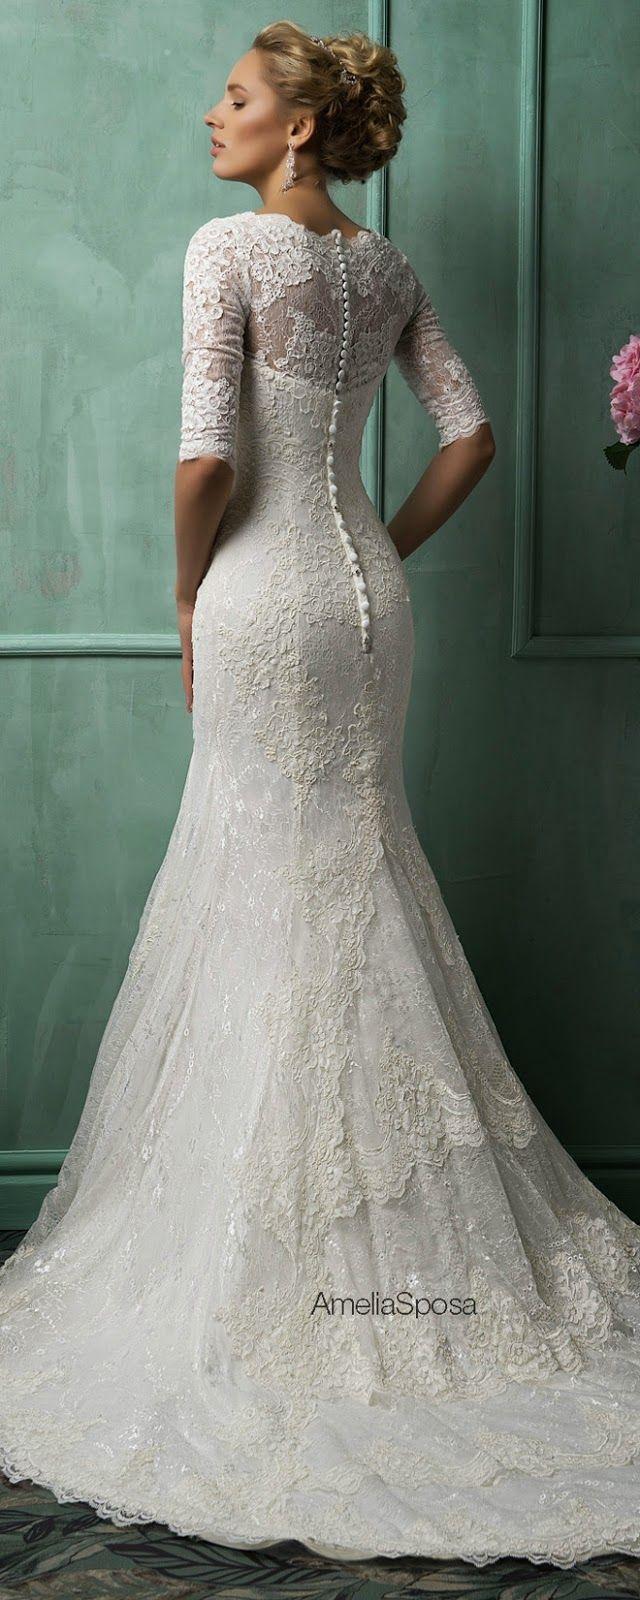 Amelia sposa 2014 wedding dresses padrinhos vestidos de noiva e amelia sposa 2014 wedding dresses belle the magazine junglespirit Choice Image